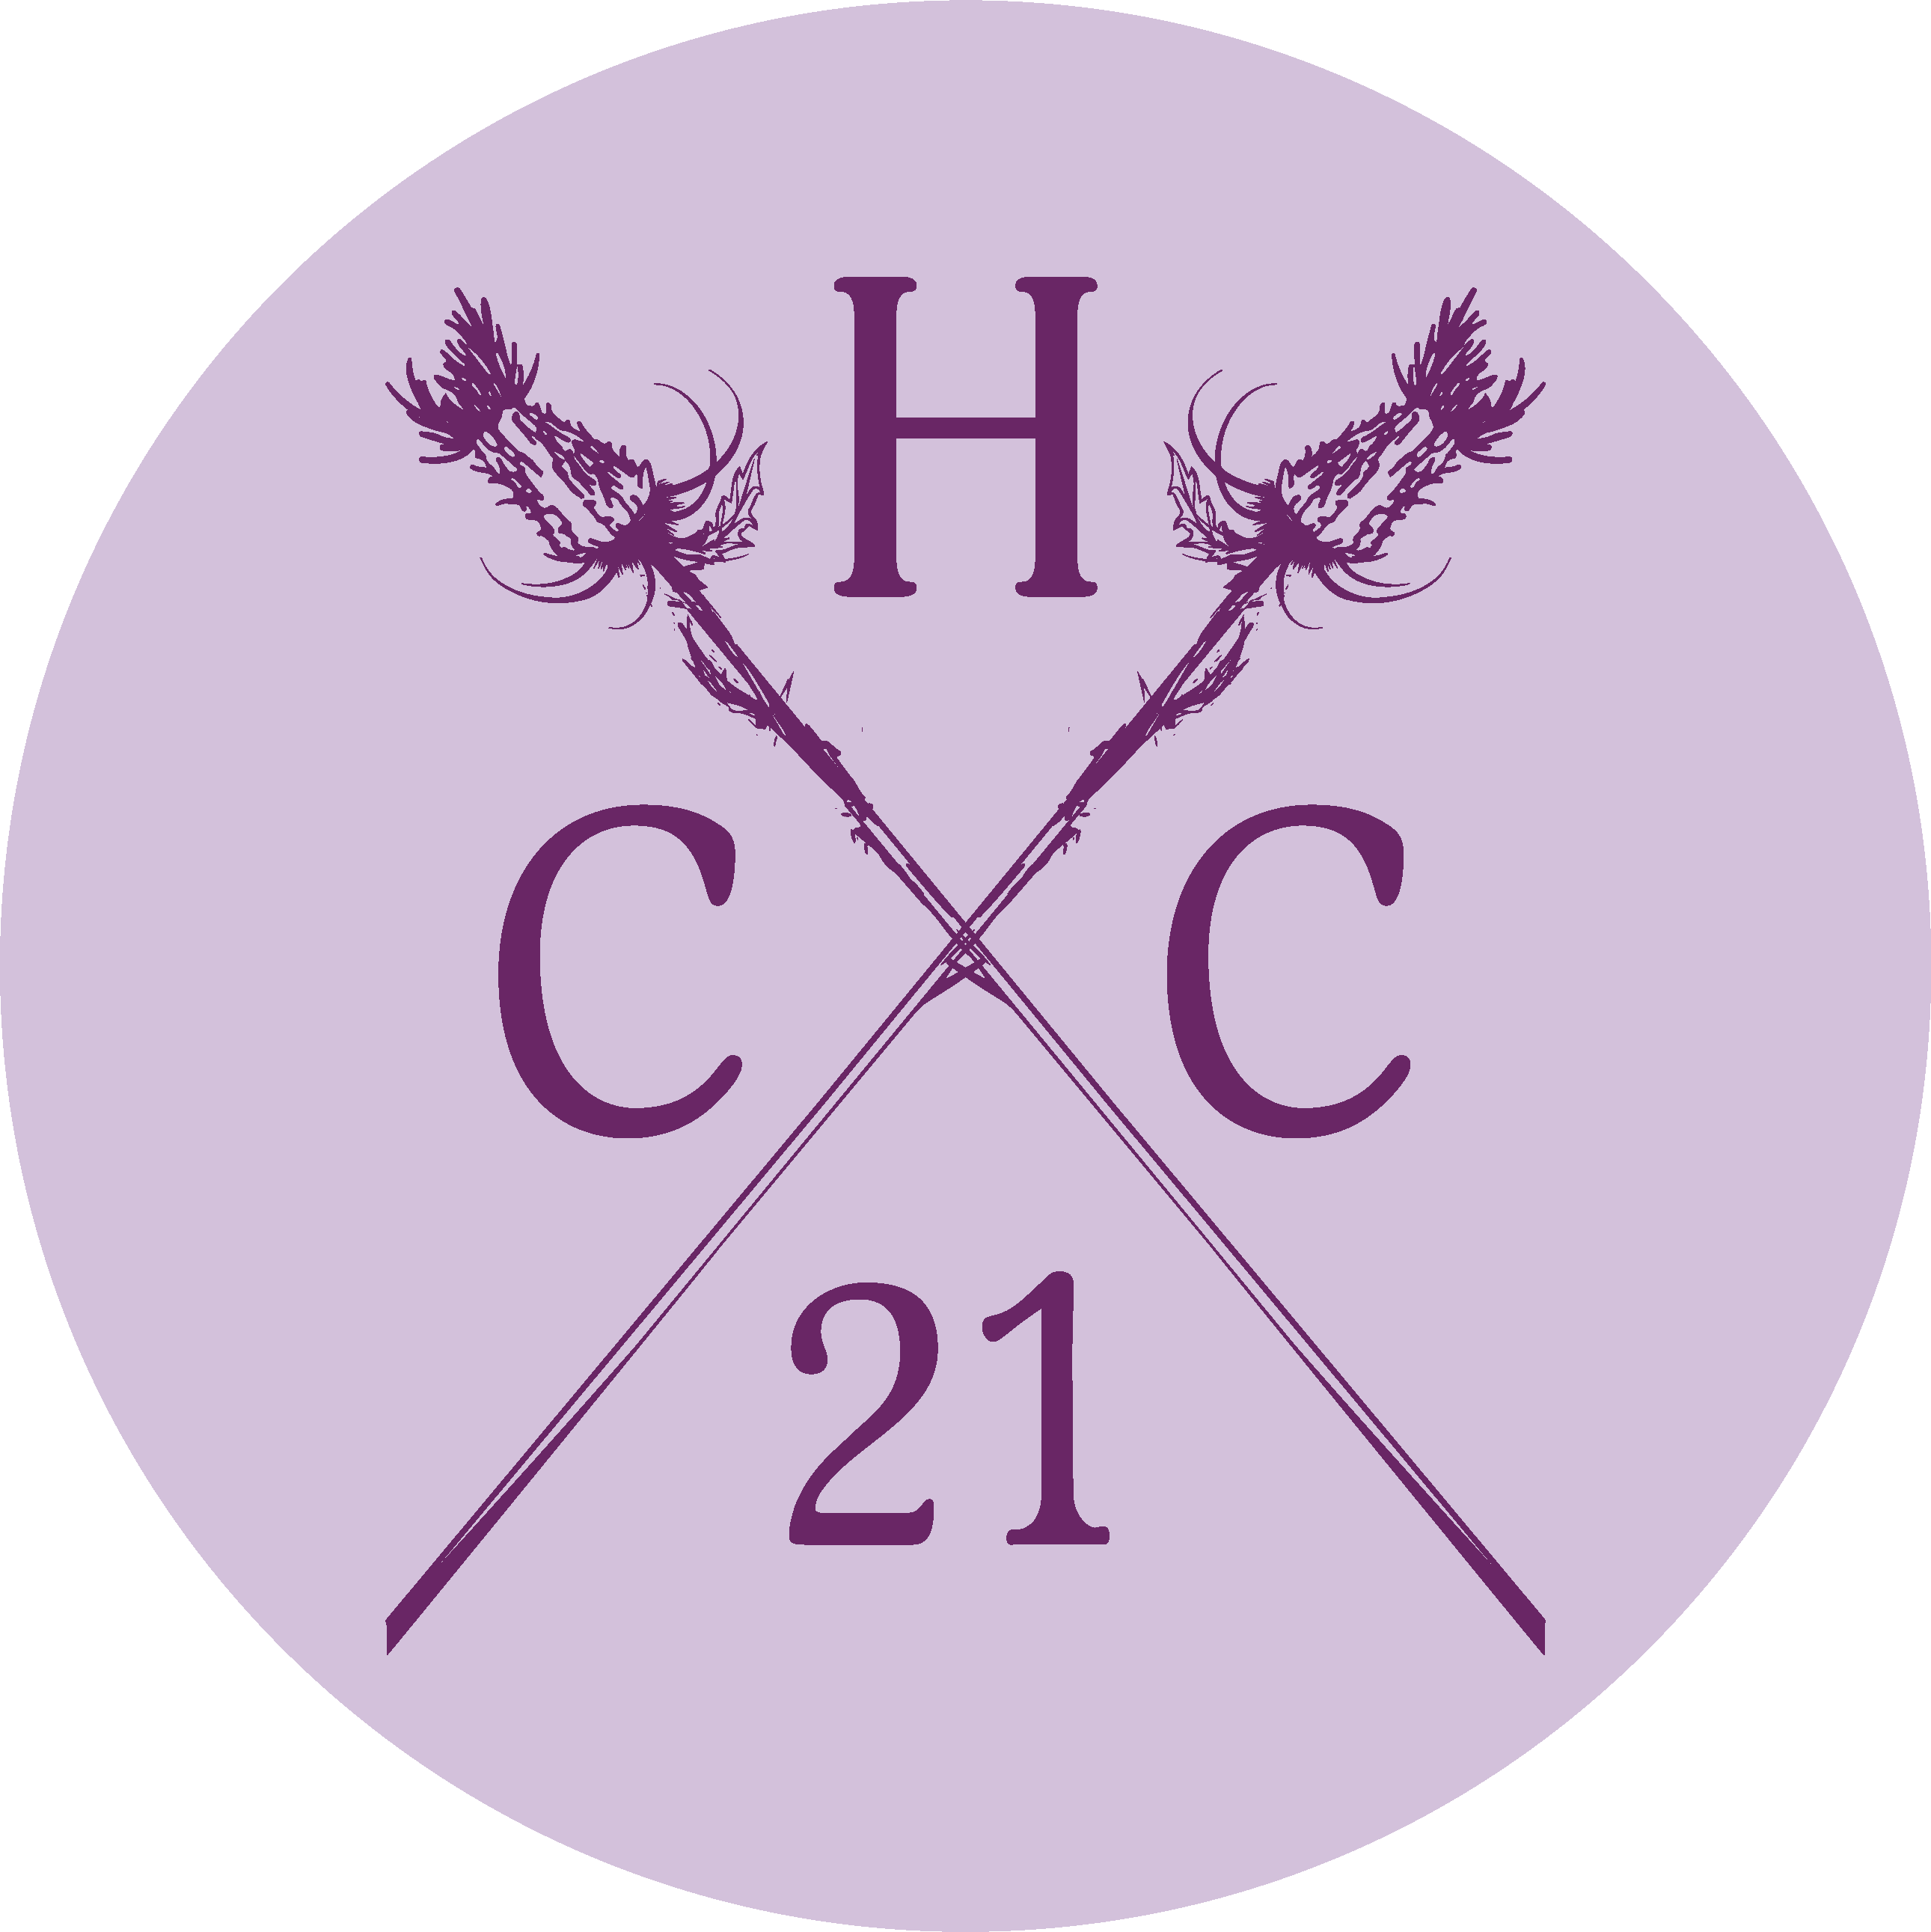 CHC21-CHC-crcle-crest-purple-reverse